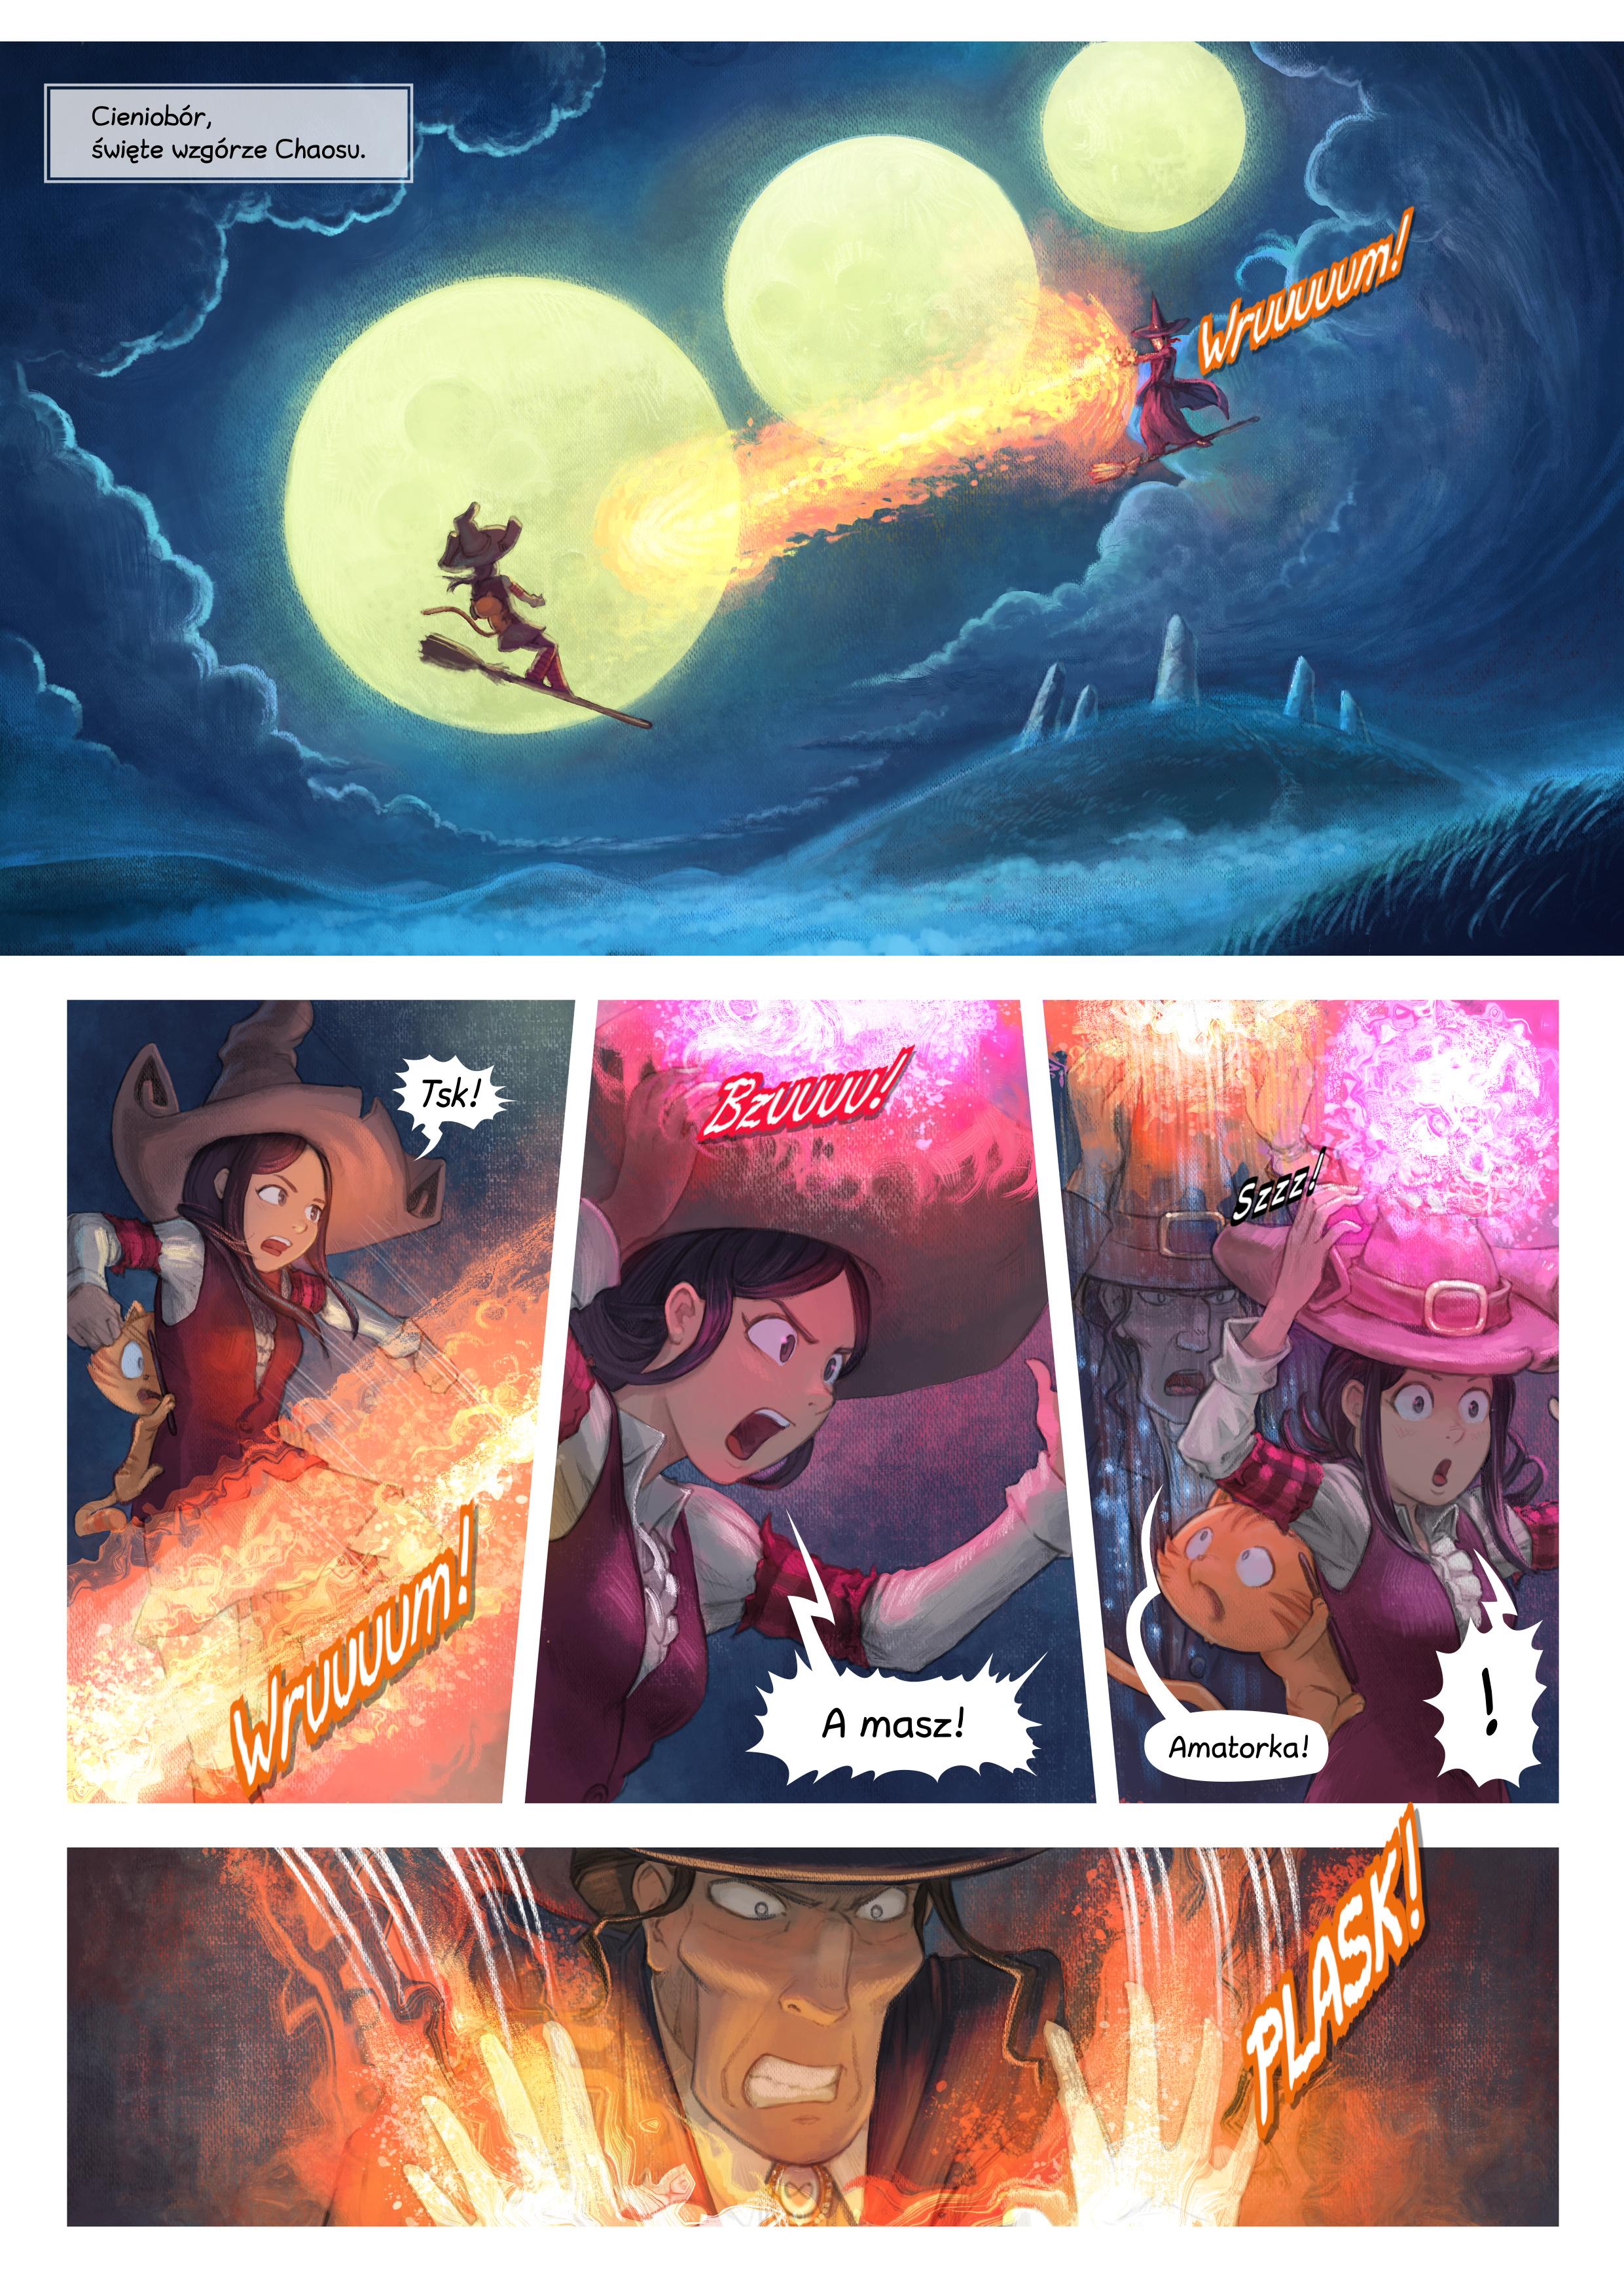 Odcinek 31: Walka, Page 1